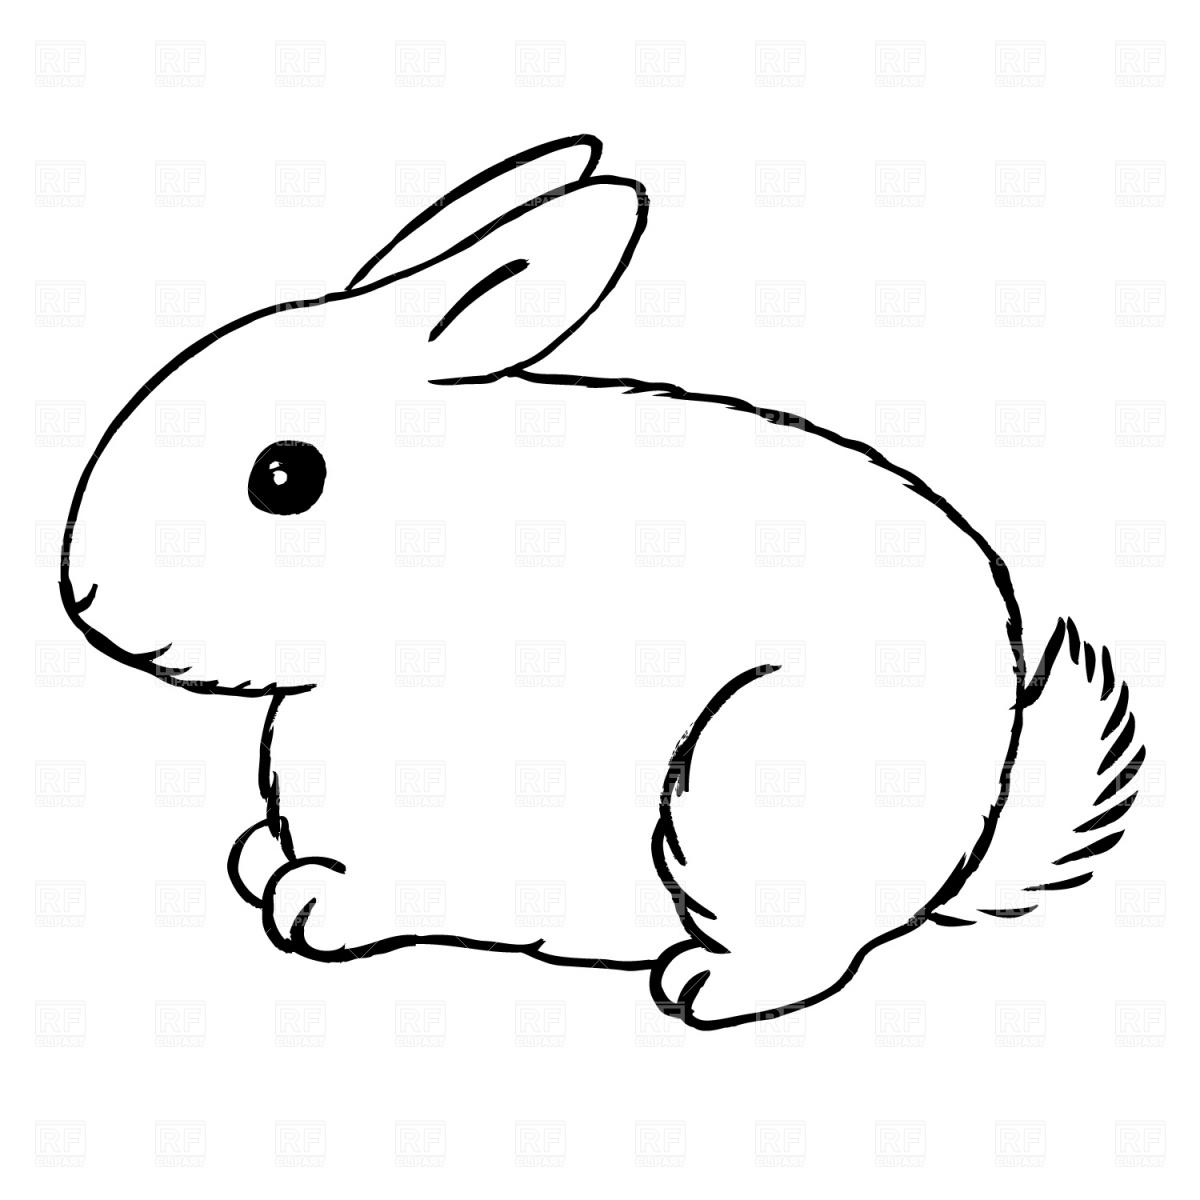 1200x1200 Clip Art Rabbit Many Interesting Cliparts